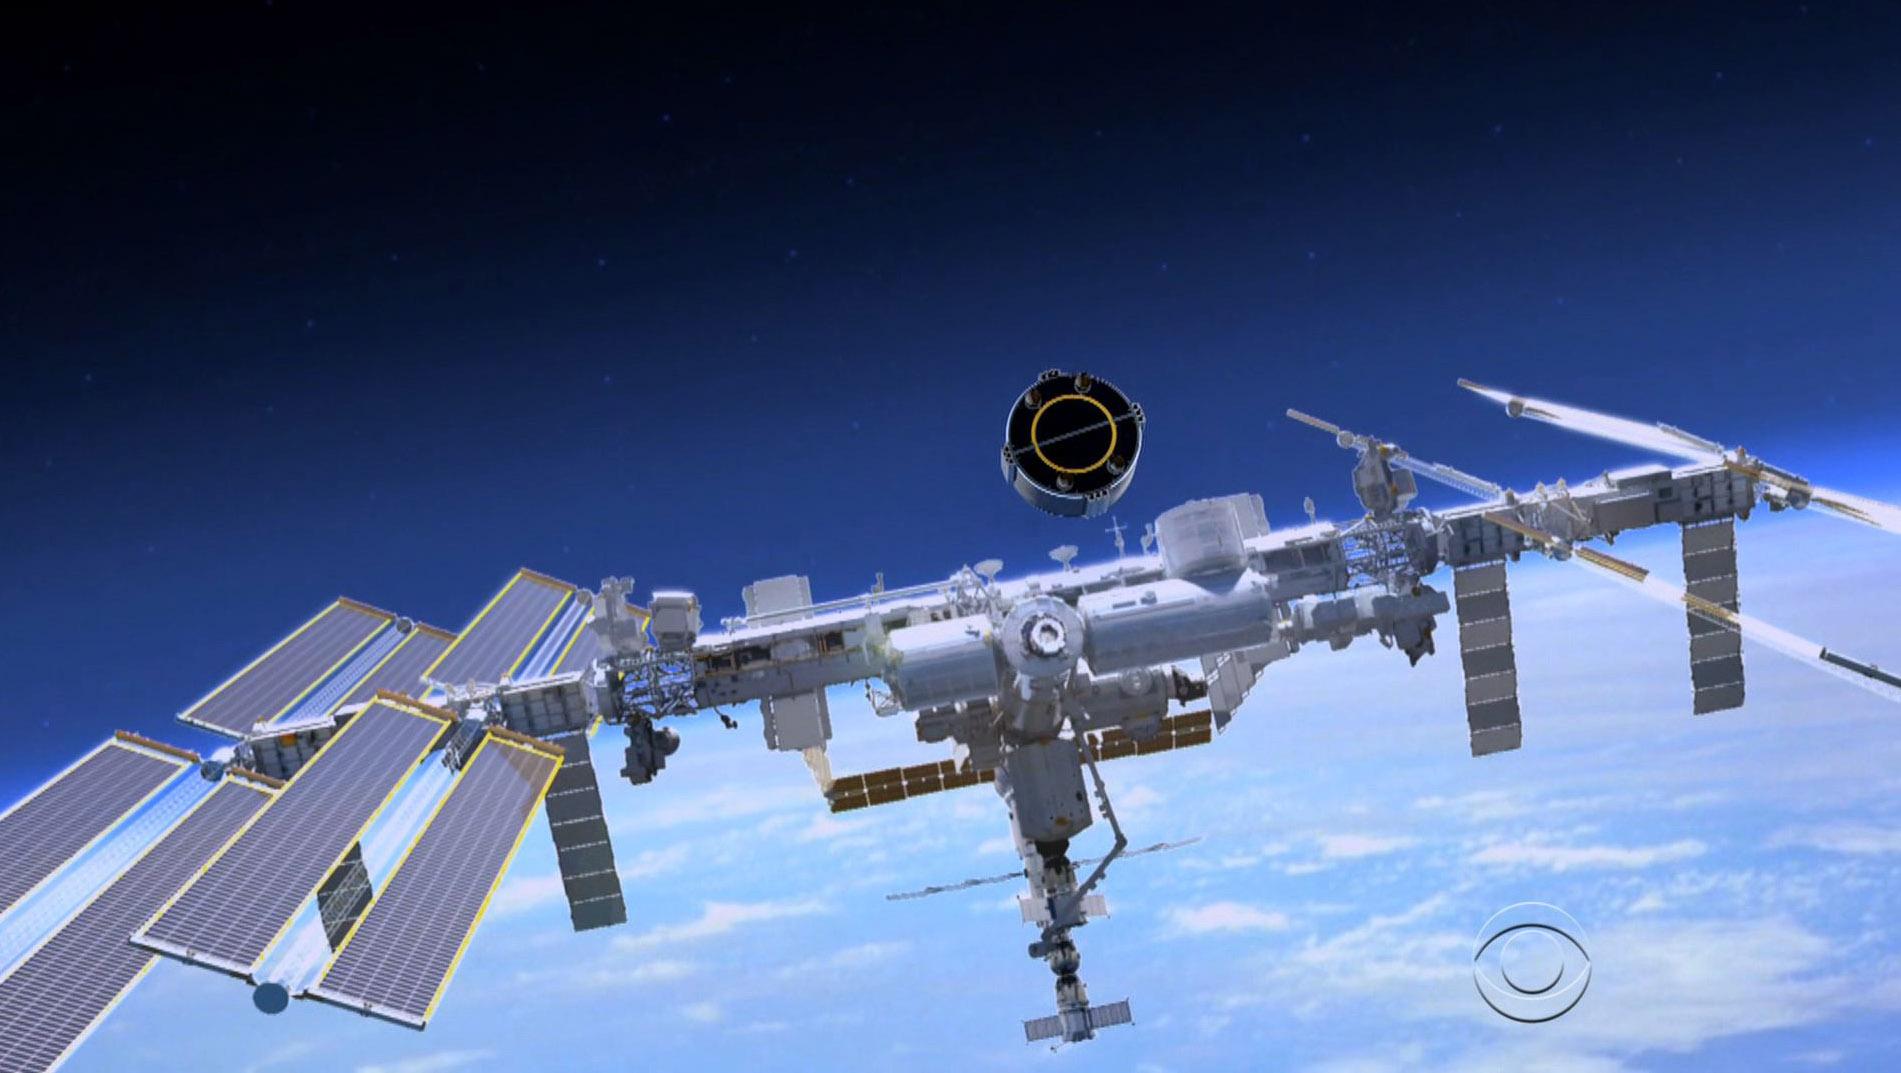 space shuttle program successor - photo #24